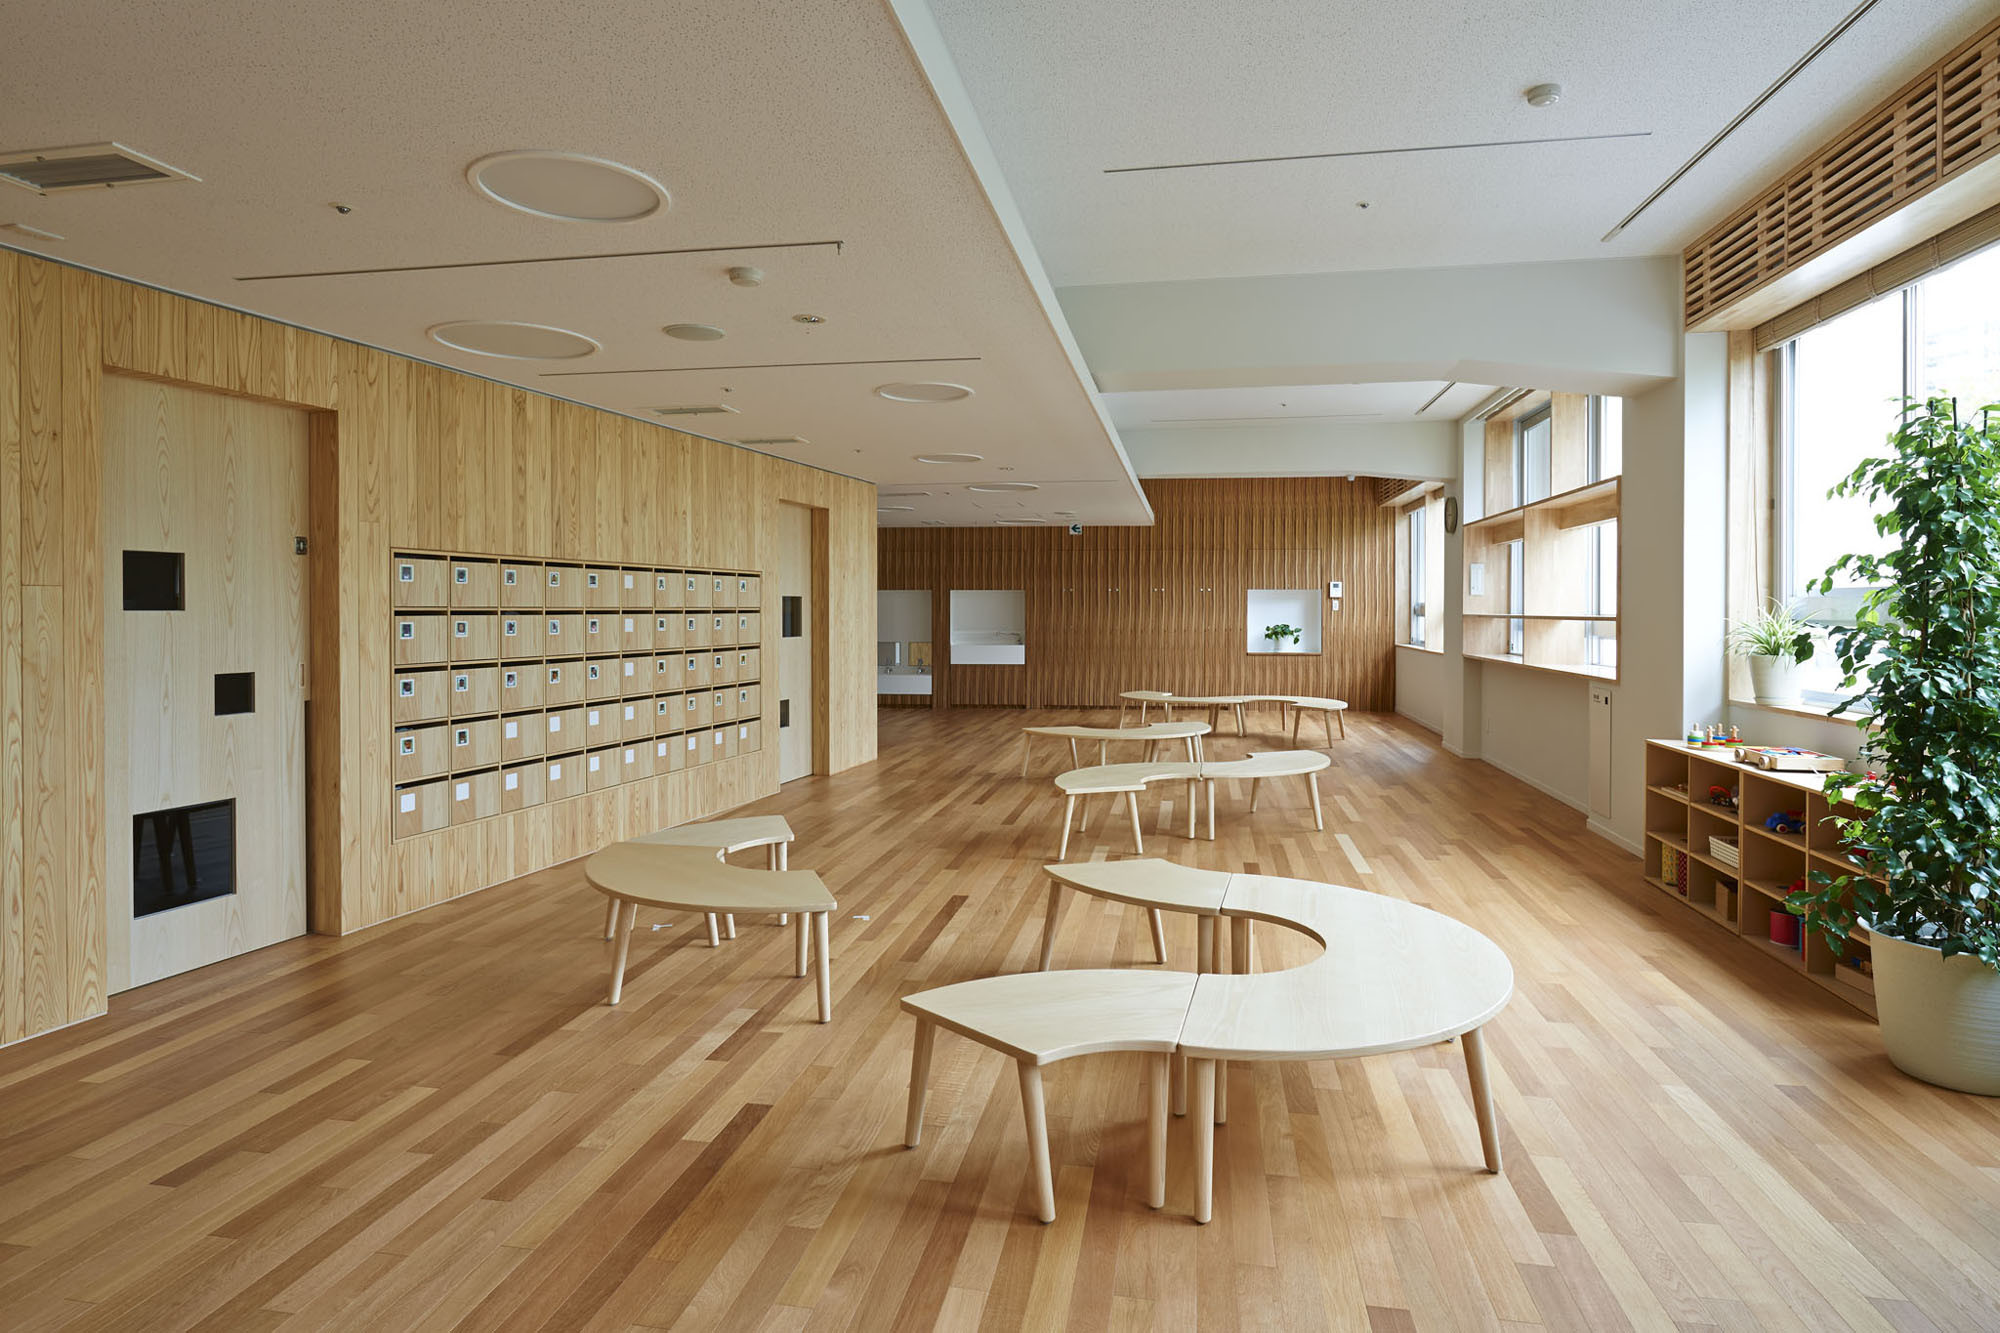 Designing A House Floor Plan Gallery Of Mokumoku Kindergarten 16a Inc 3